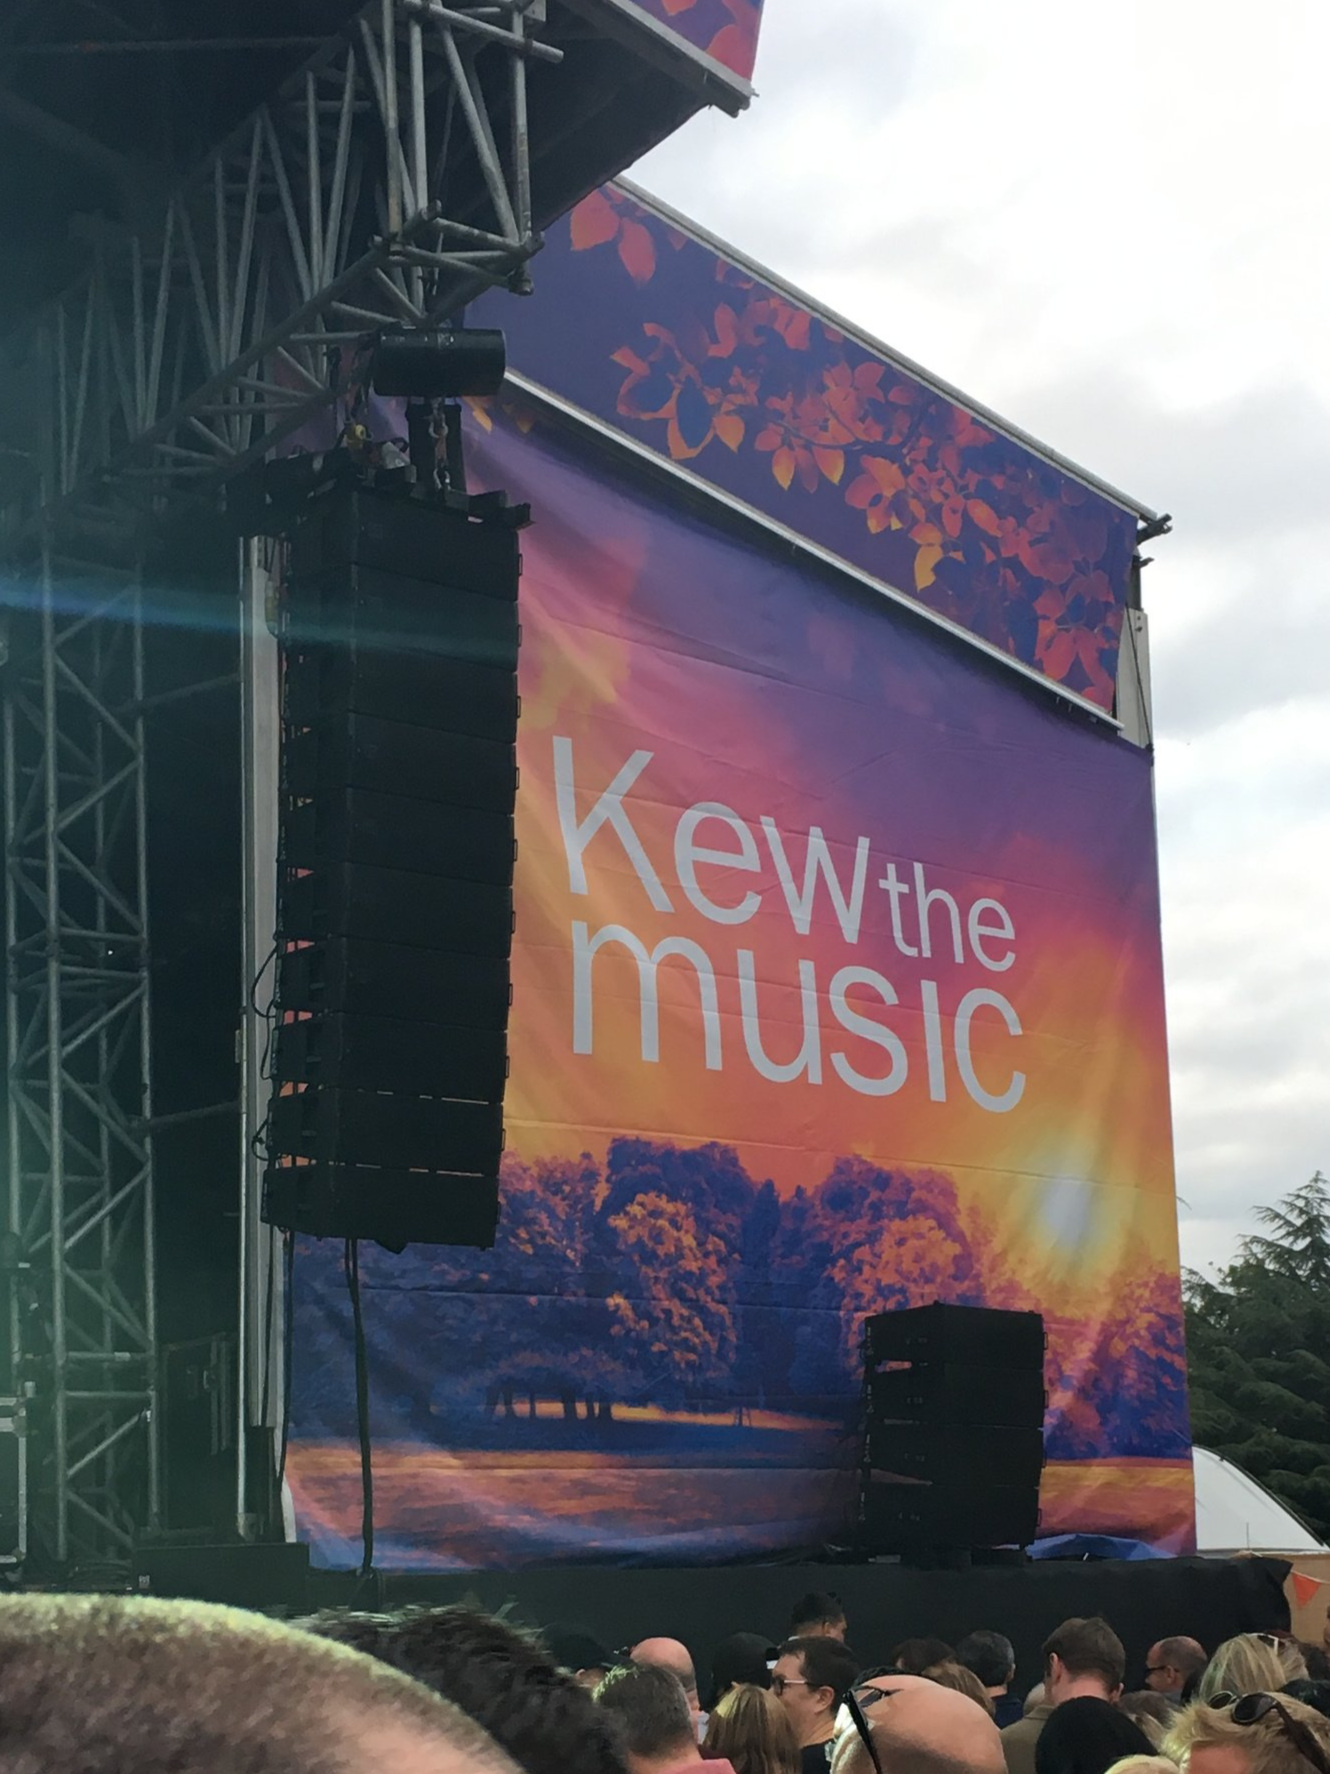 Kew The Music. All photos taken by Matt Dobbie